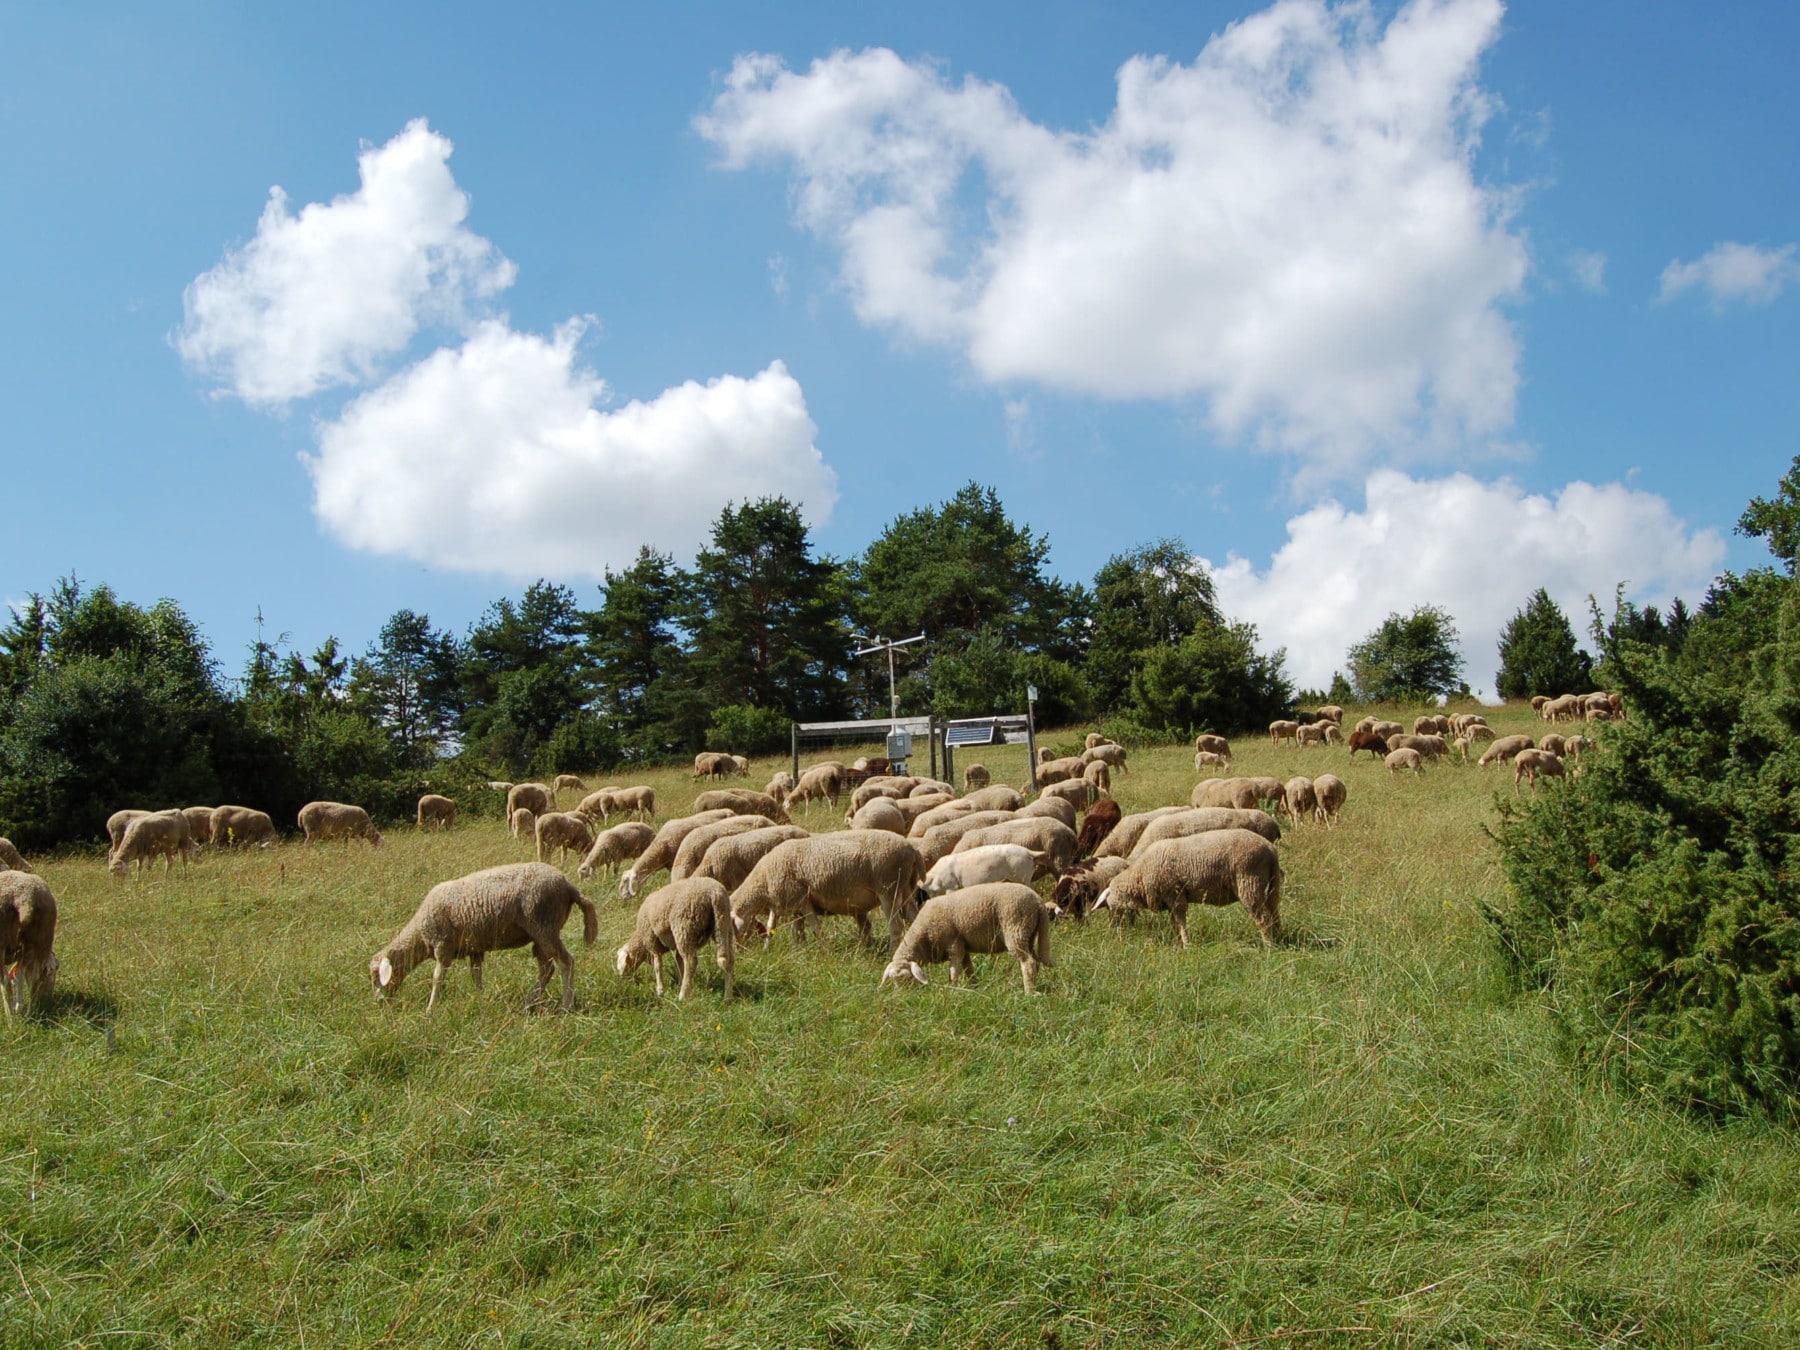 Photo shows a grazing flock of sheep on a juniper heath